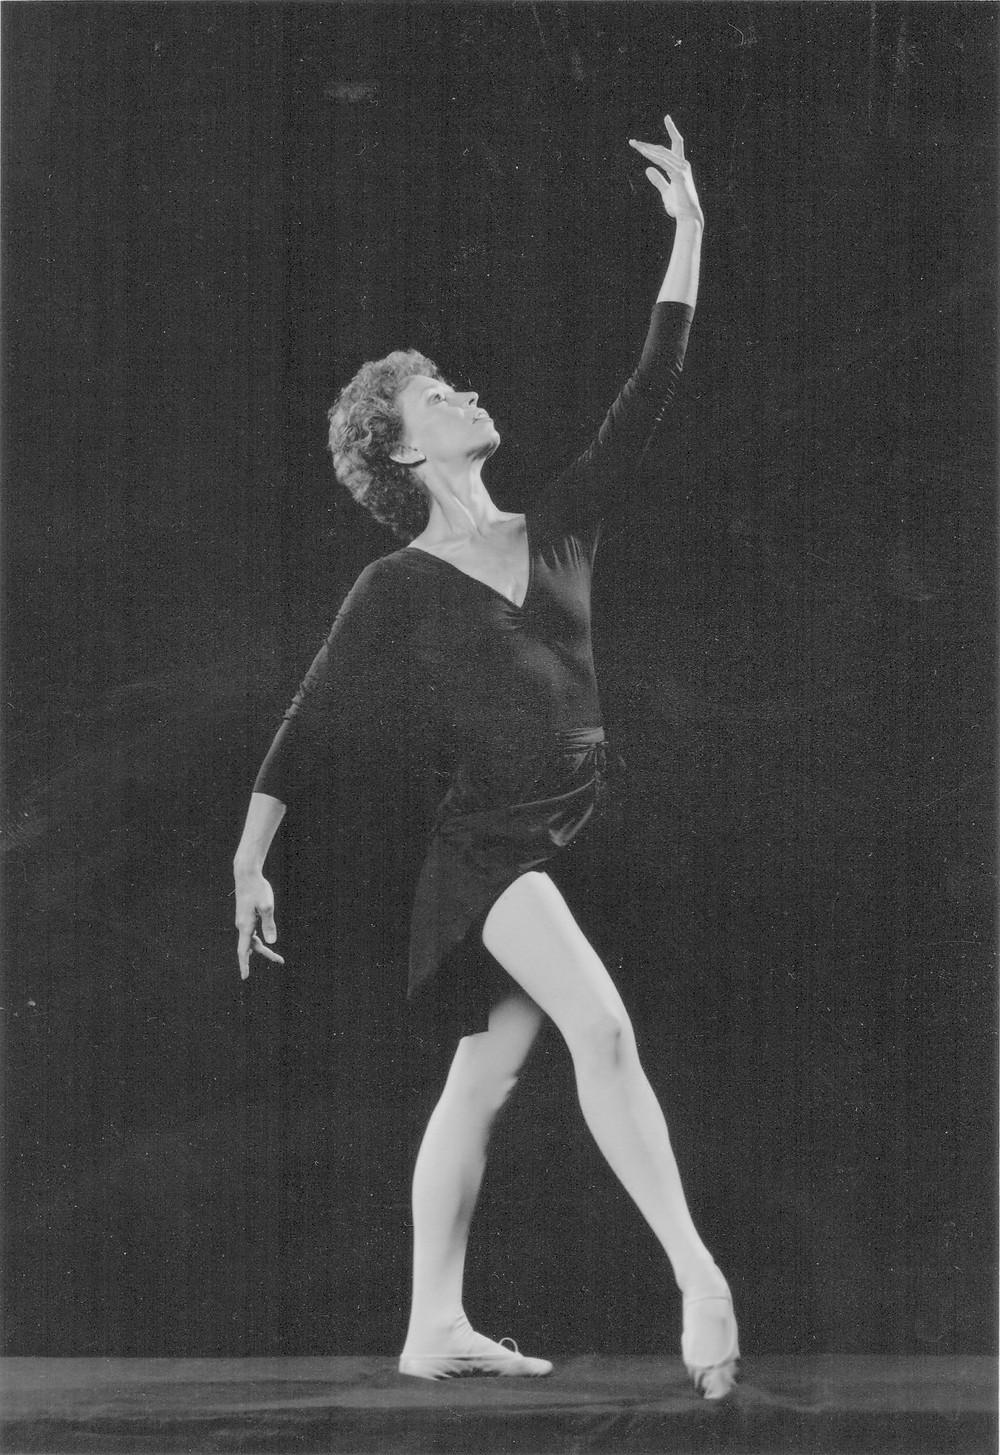 Mrs. Kathy Gasper